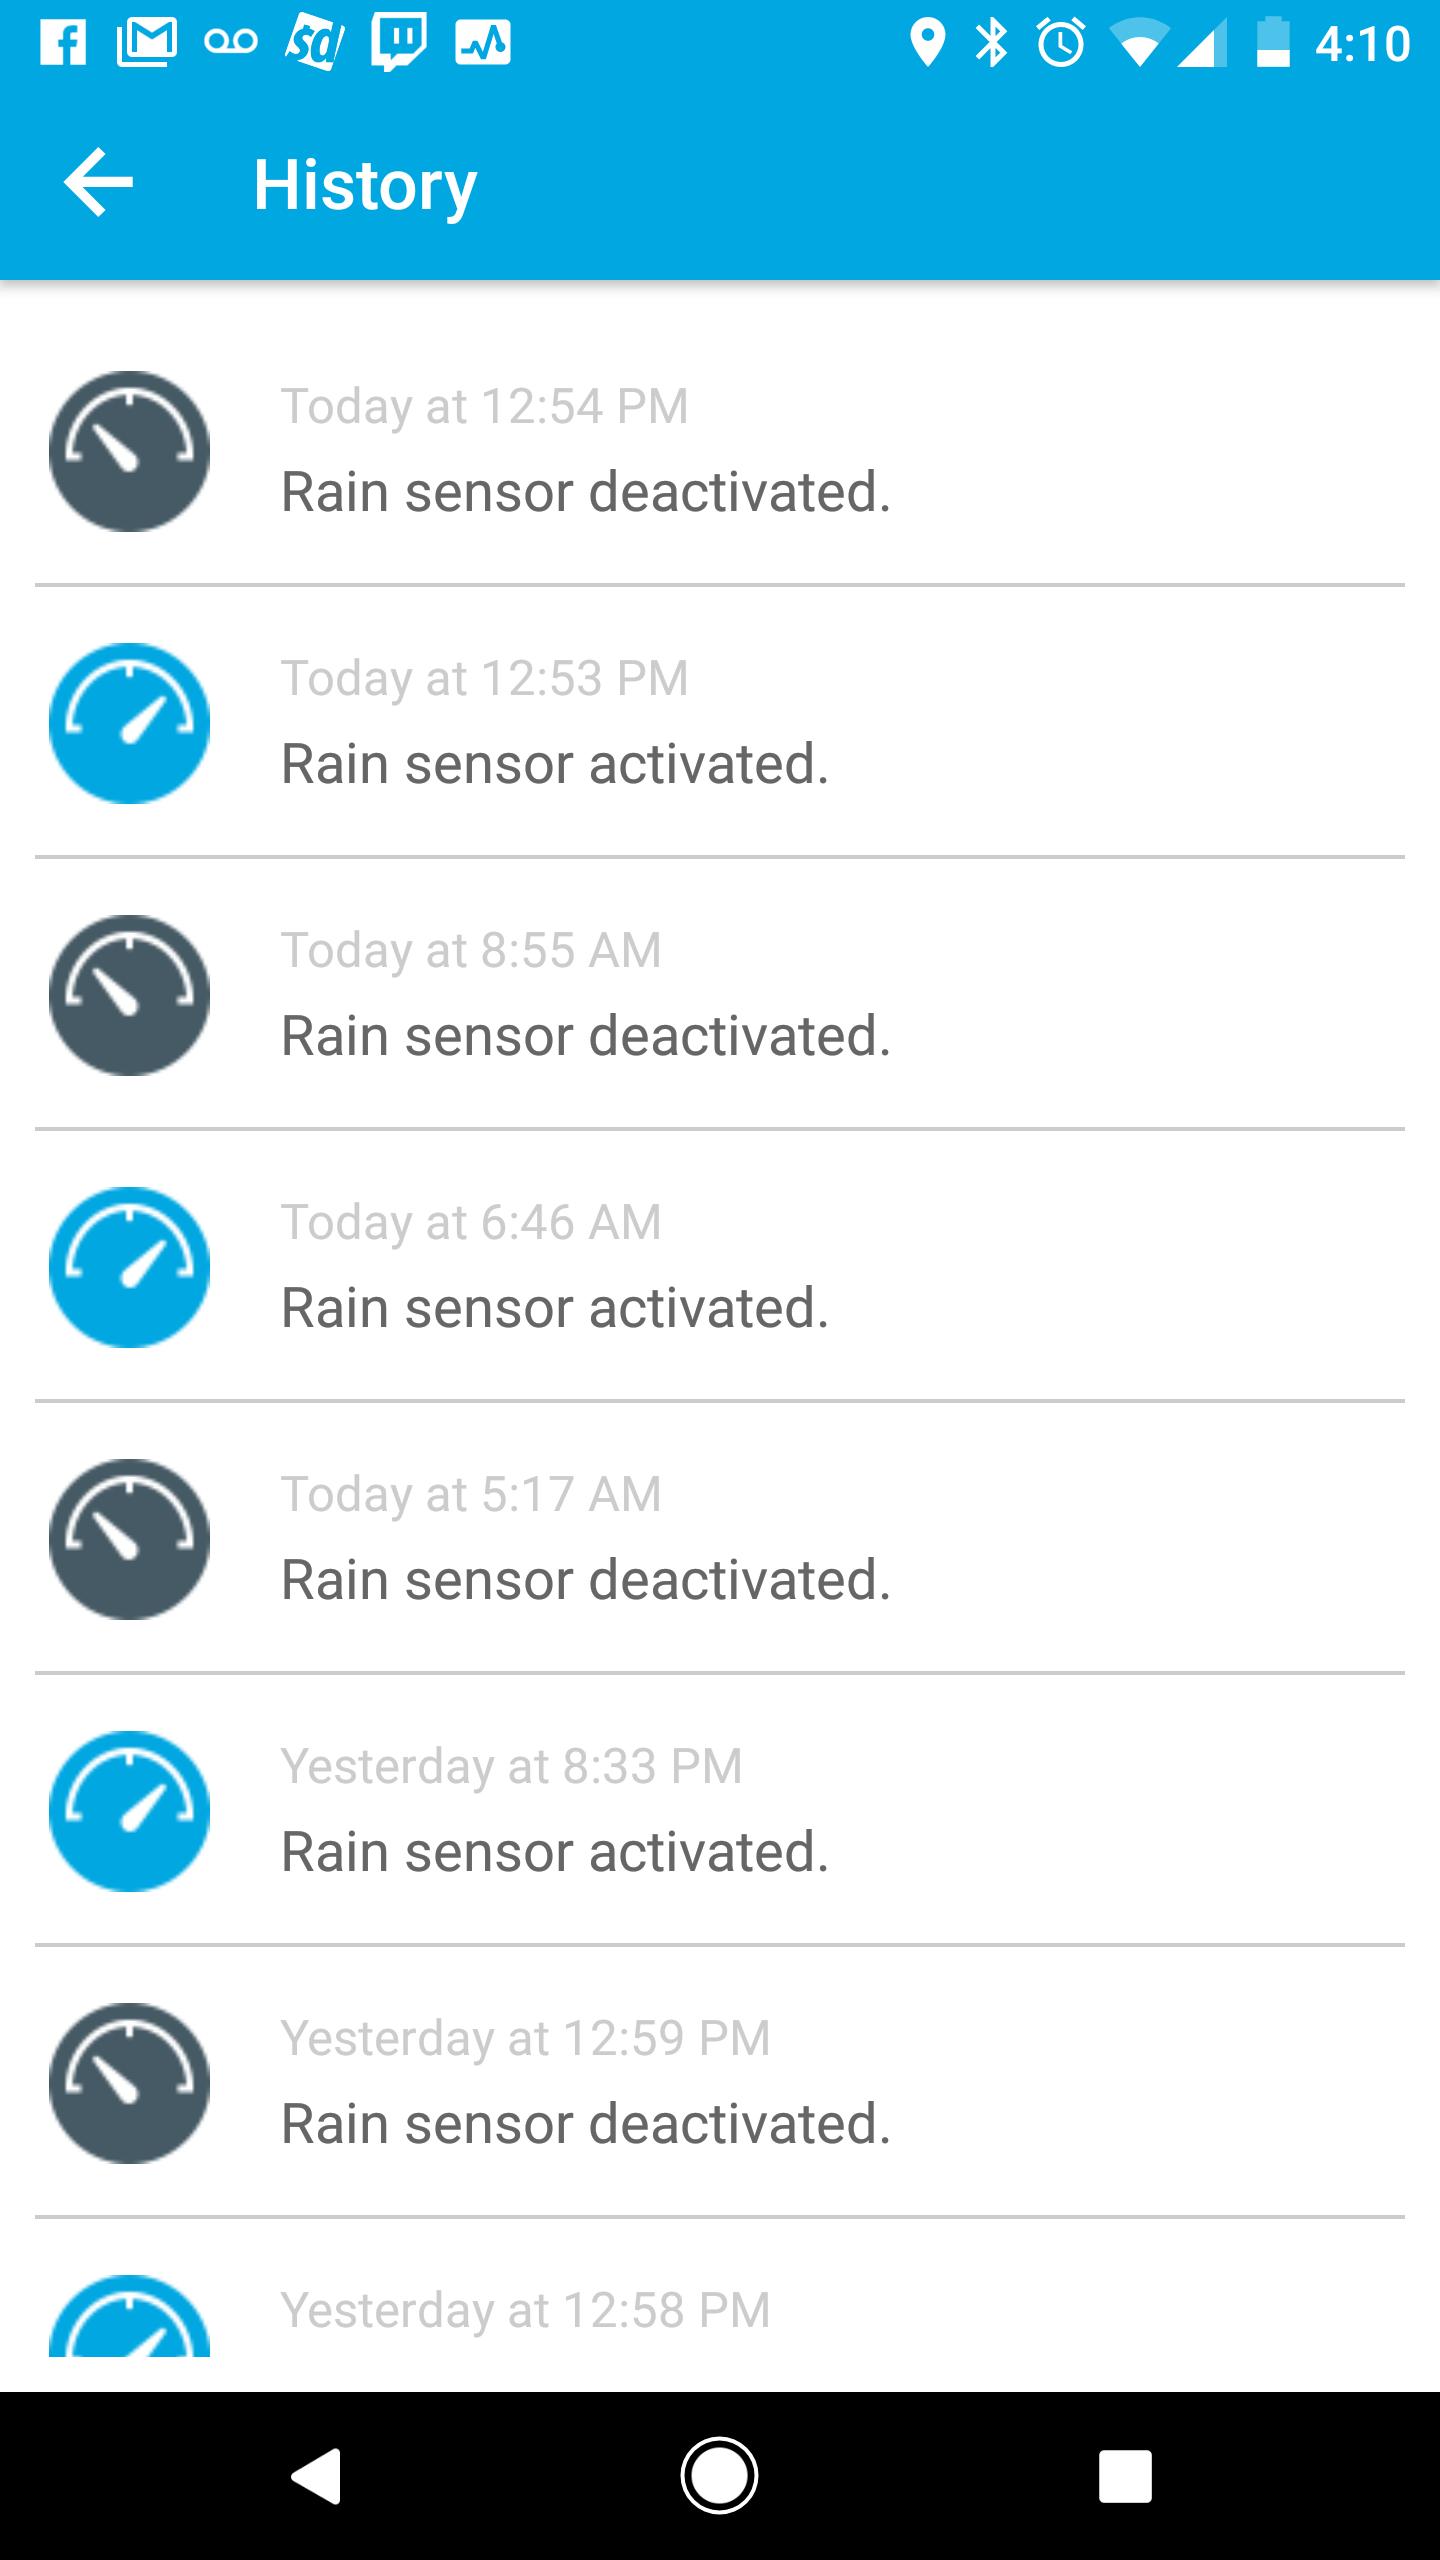 Replacing an existing water sprinkler system - Rain Sensors